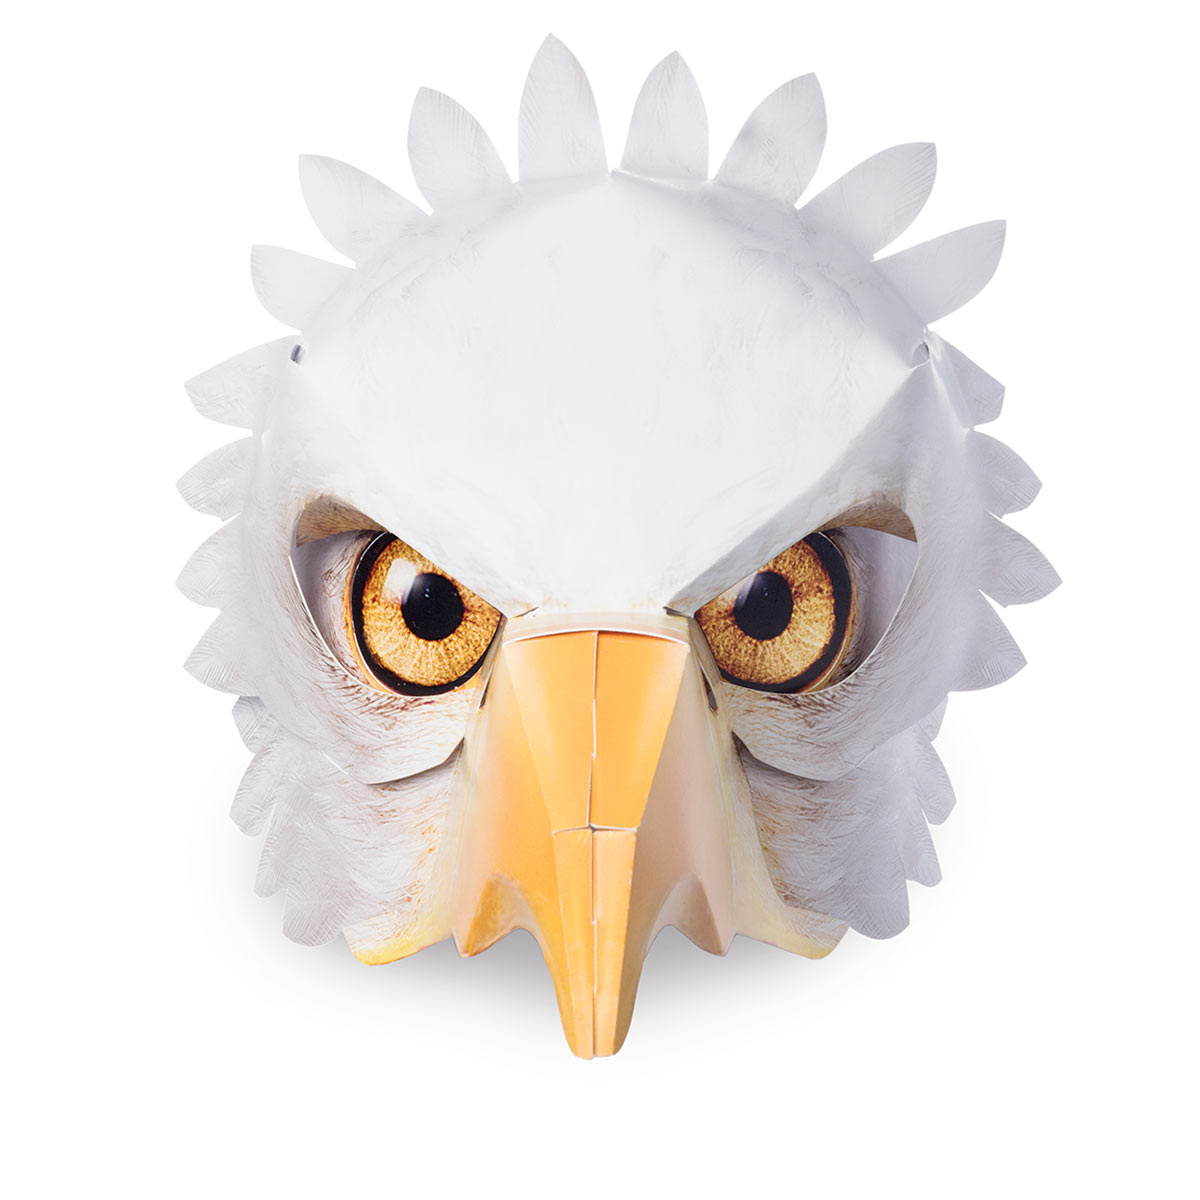 ....Maske Seeadler ..Bald eagle mask....